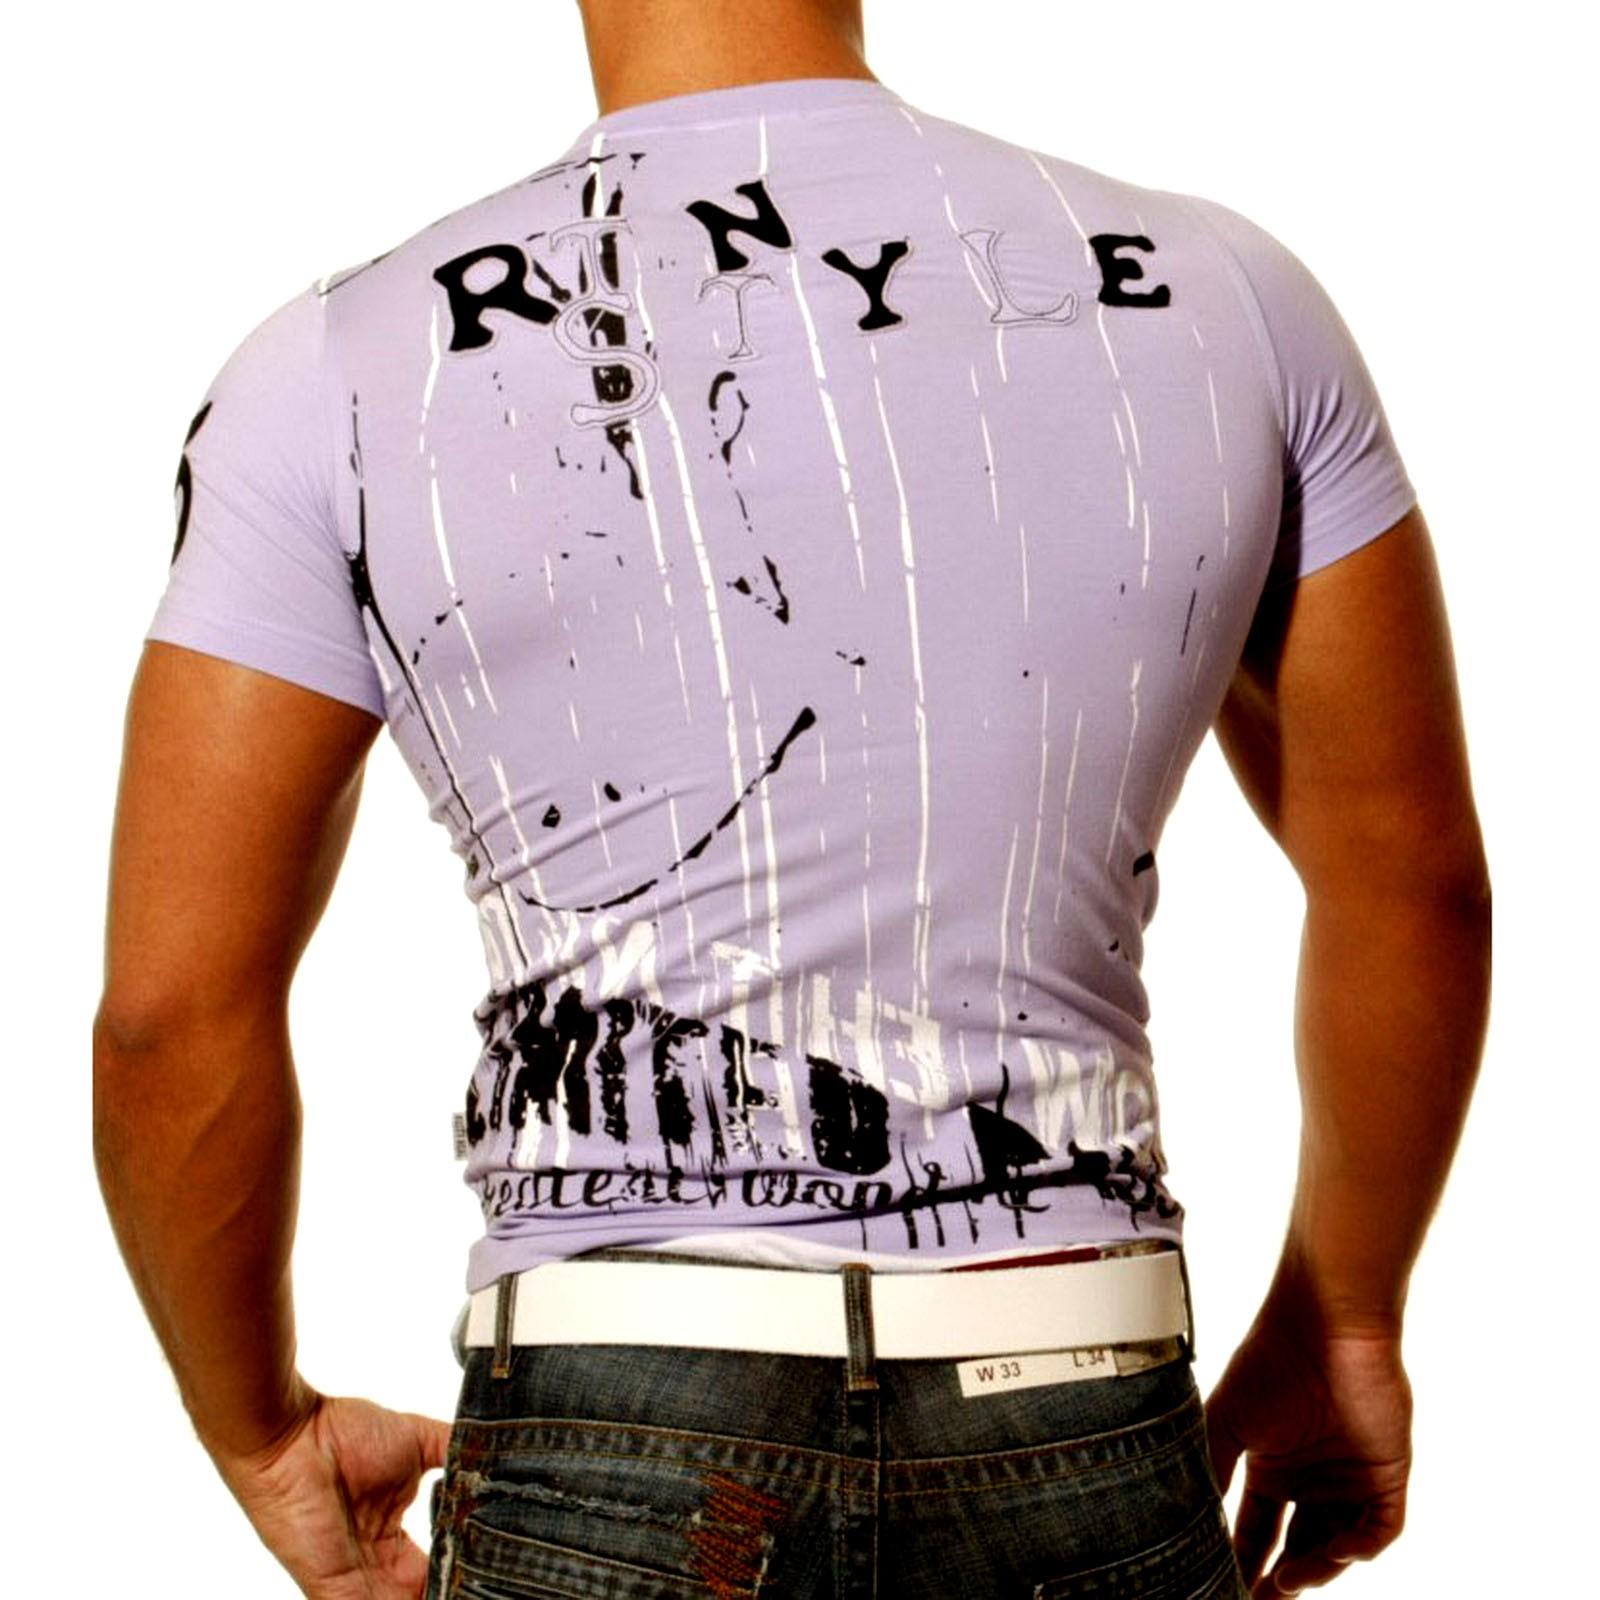 Rusty Neal Kurzarm Slim Fit Herren Rundhals Shirt Motiv T-Shirt Lila RN-708